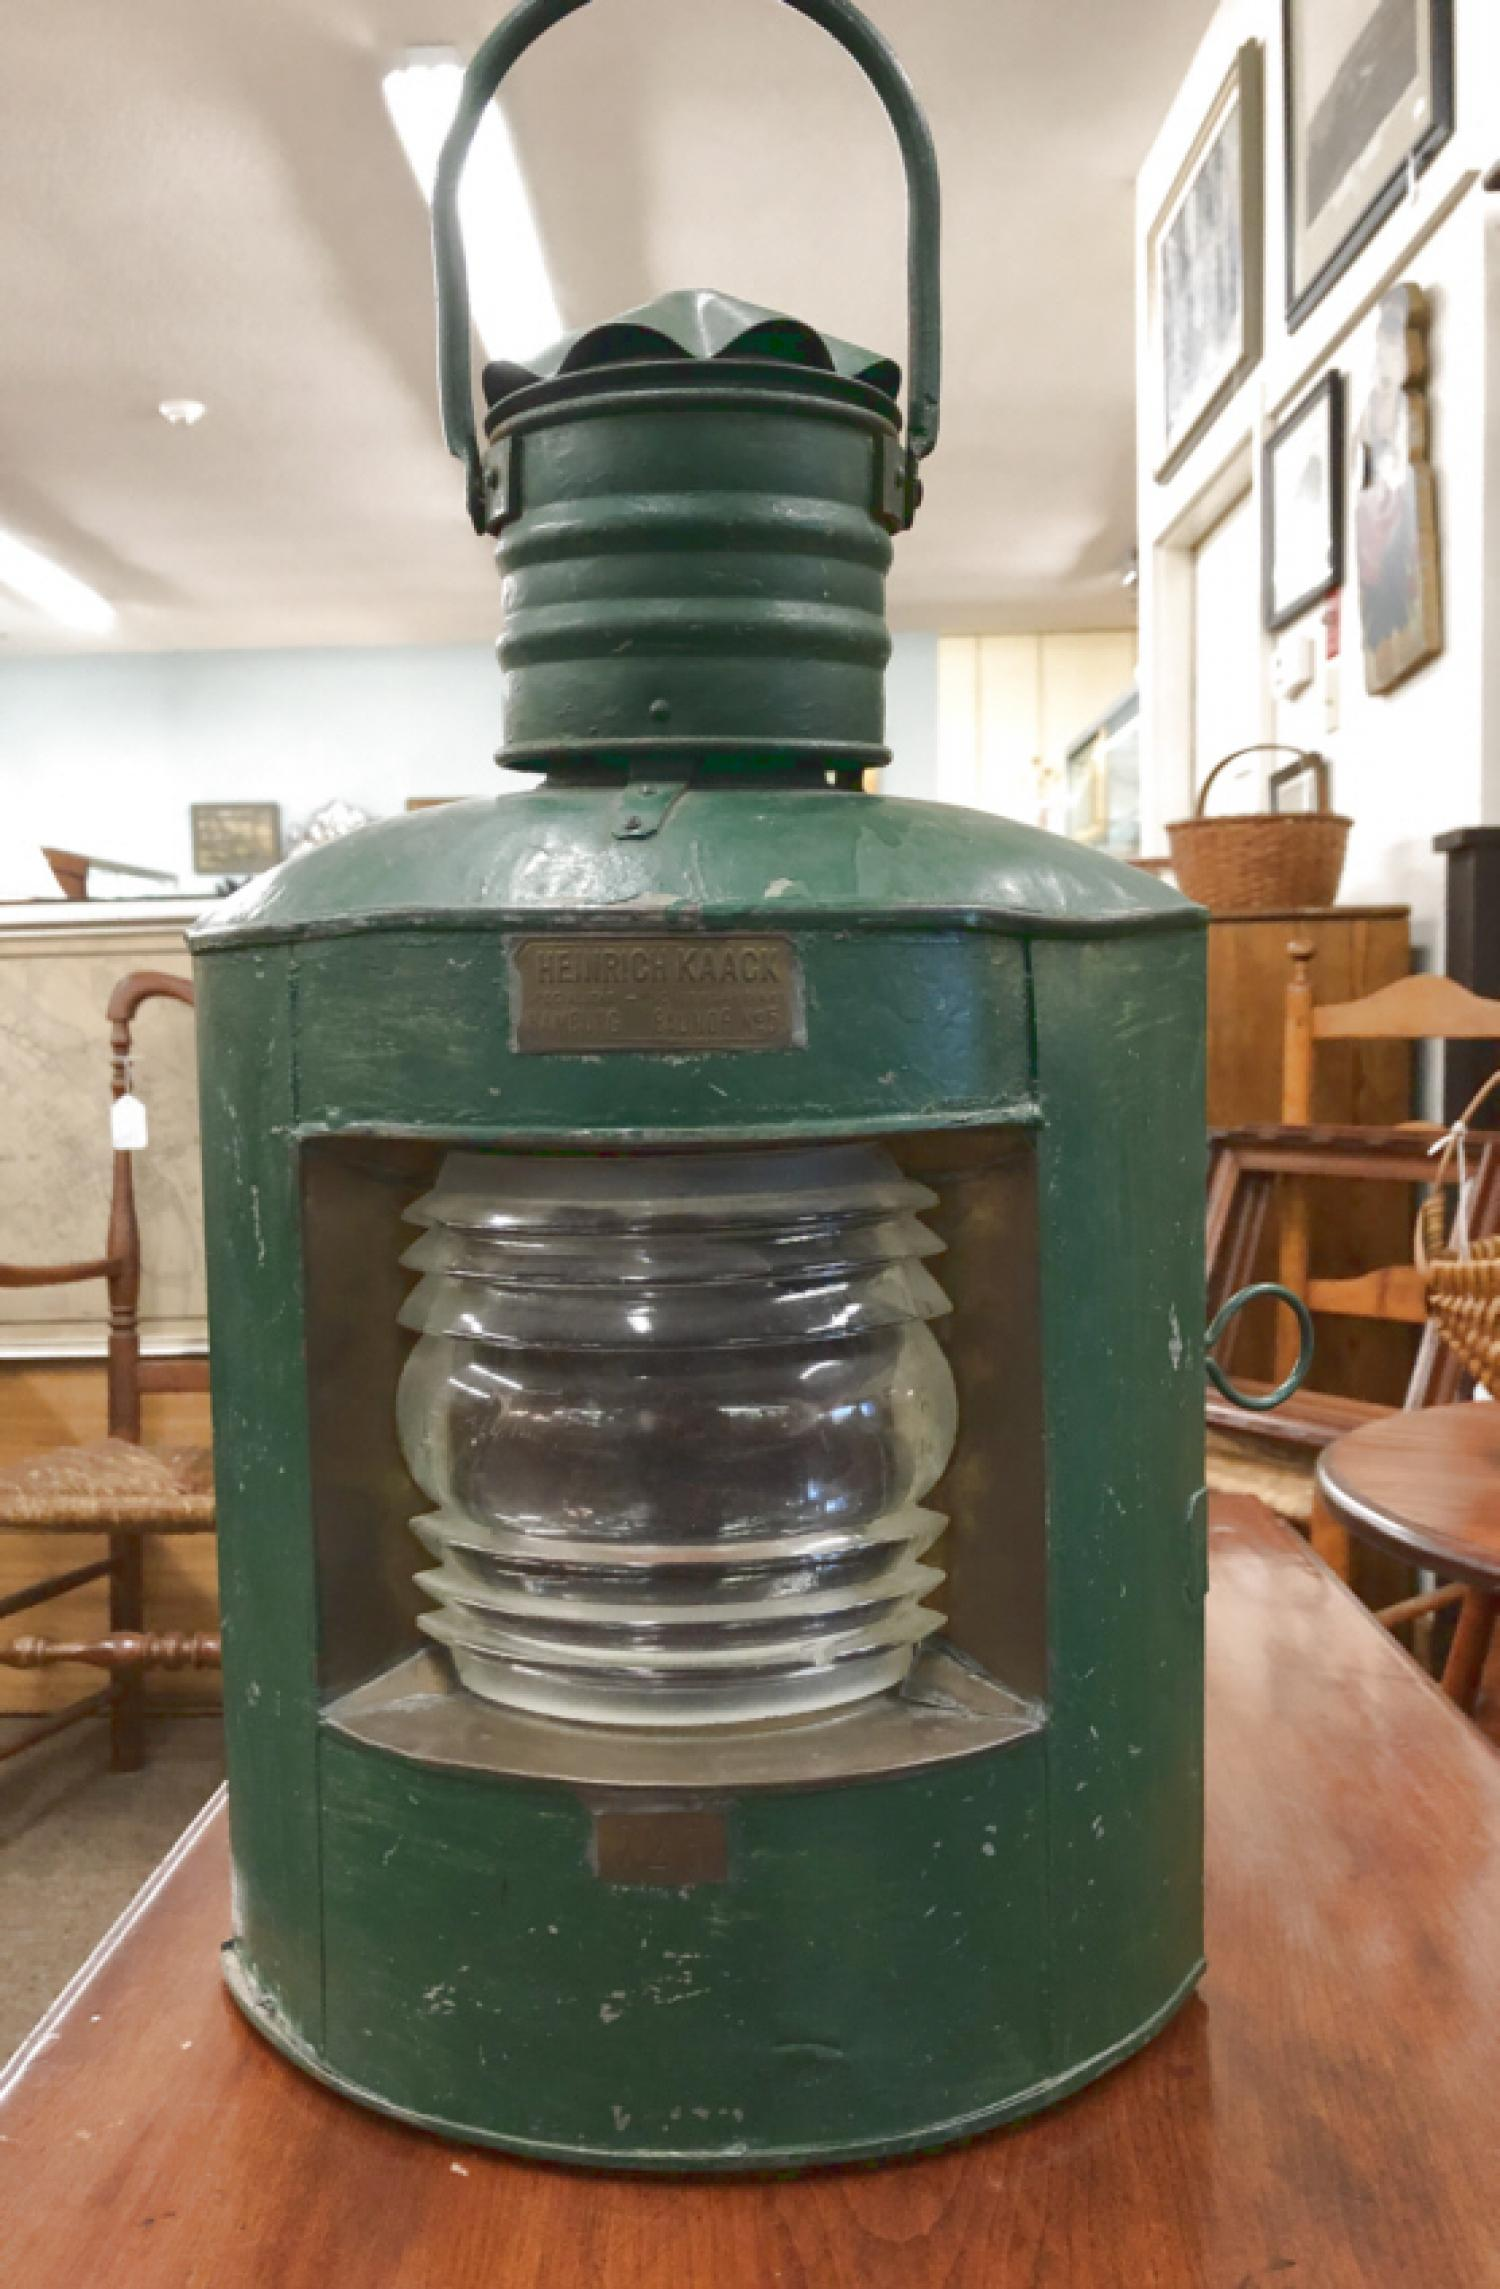 Heinrick Kaack Hamburg Bauhof 5 Lantern c1880